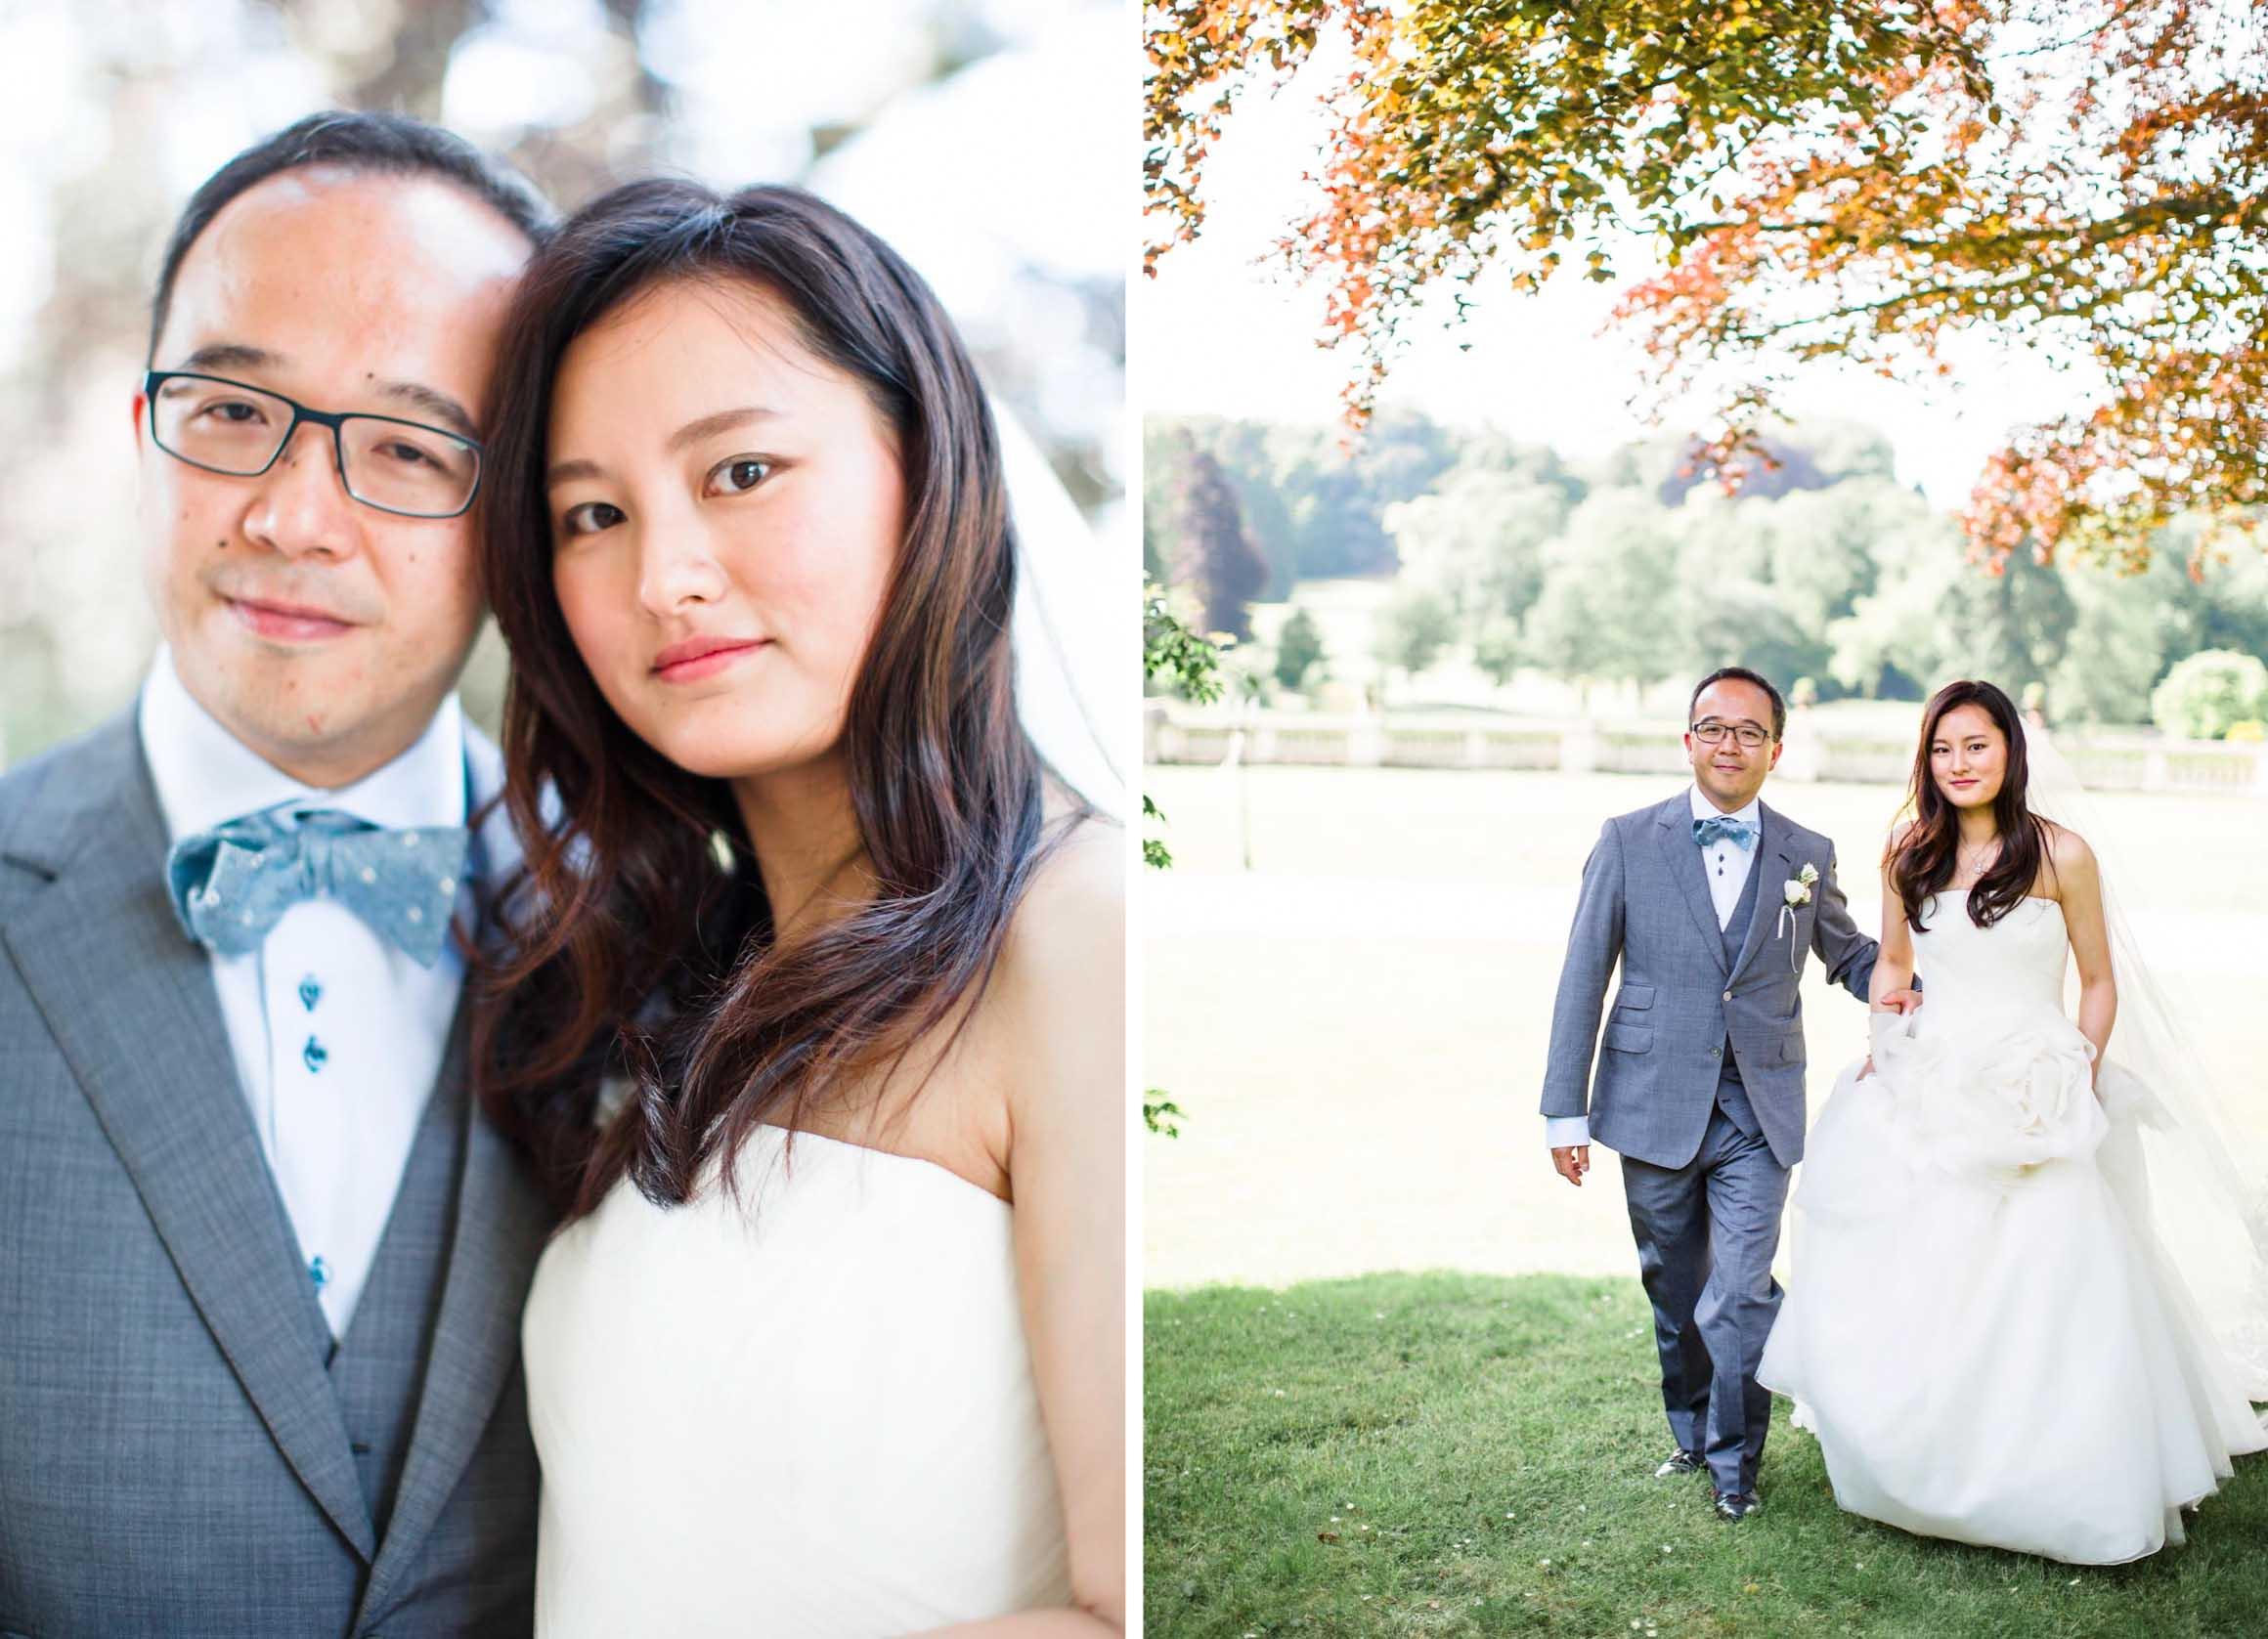 Amy O'Boyle Photography- Chateau Bouffemont Wedding- France Wedding Photographer 11.jpg